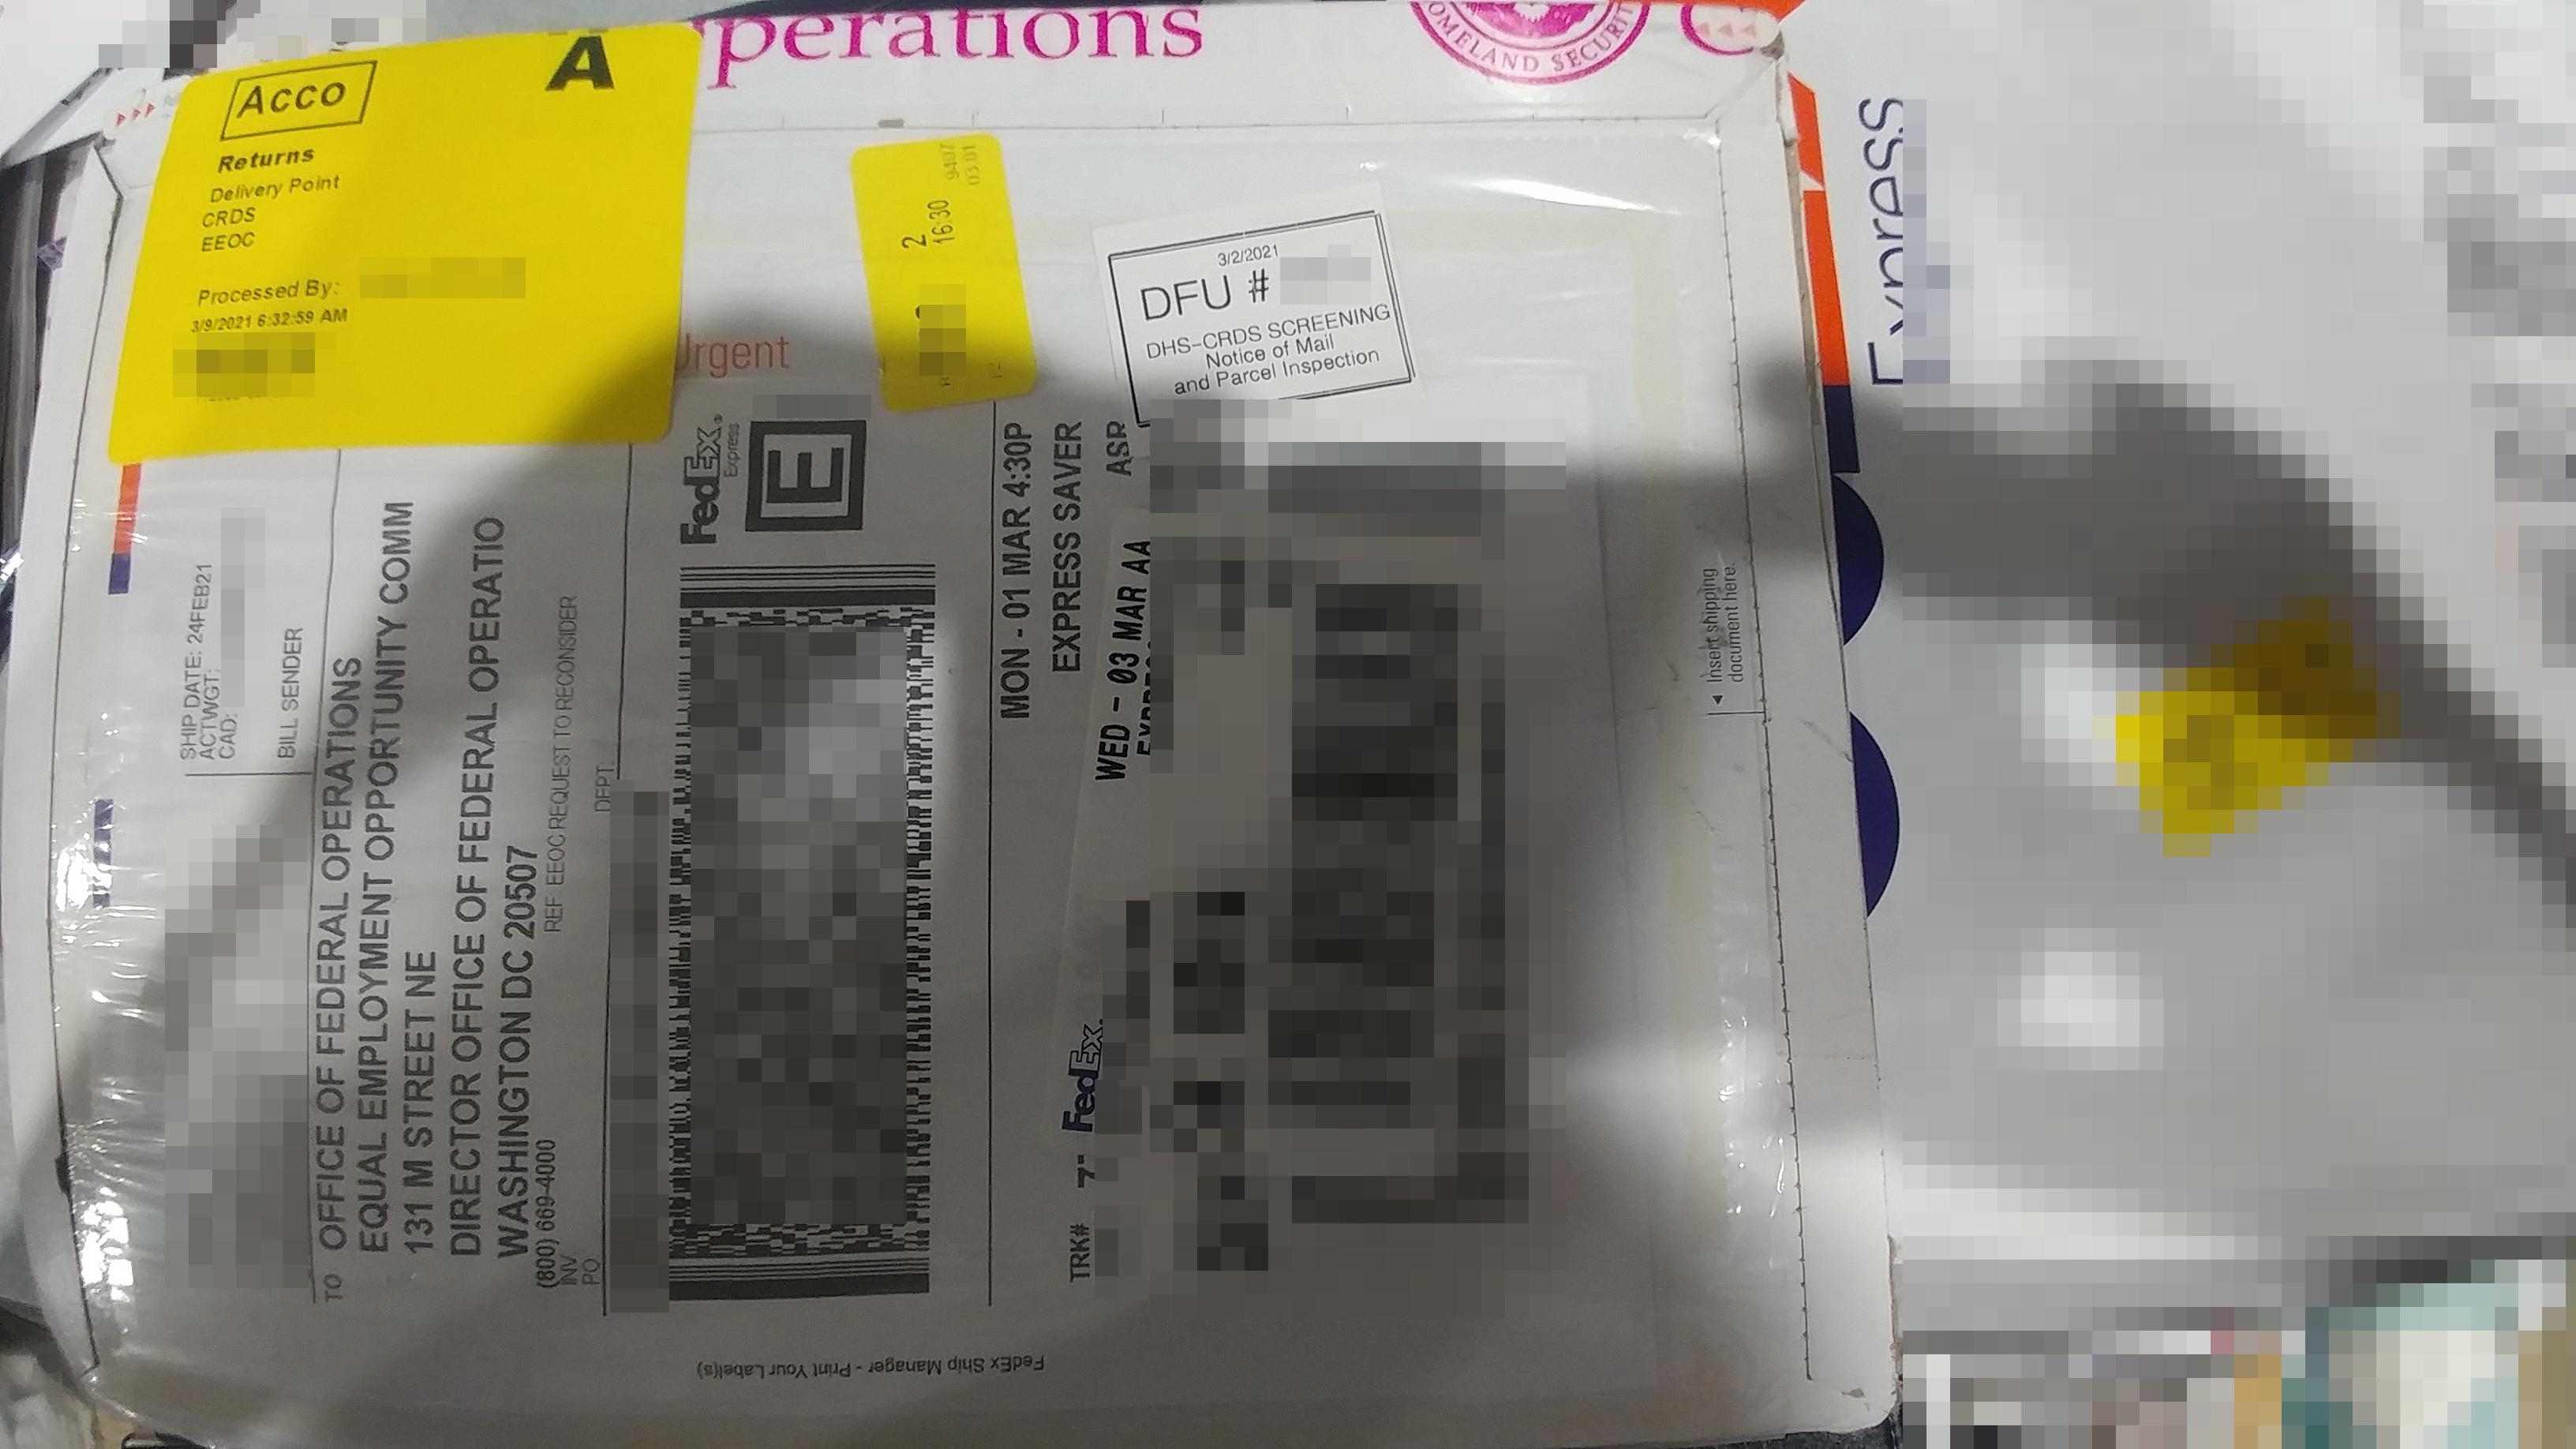 FedExDHSTapeEnvelopeLabel.jpg